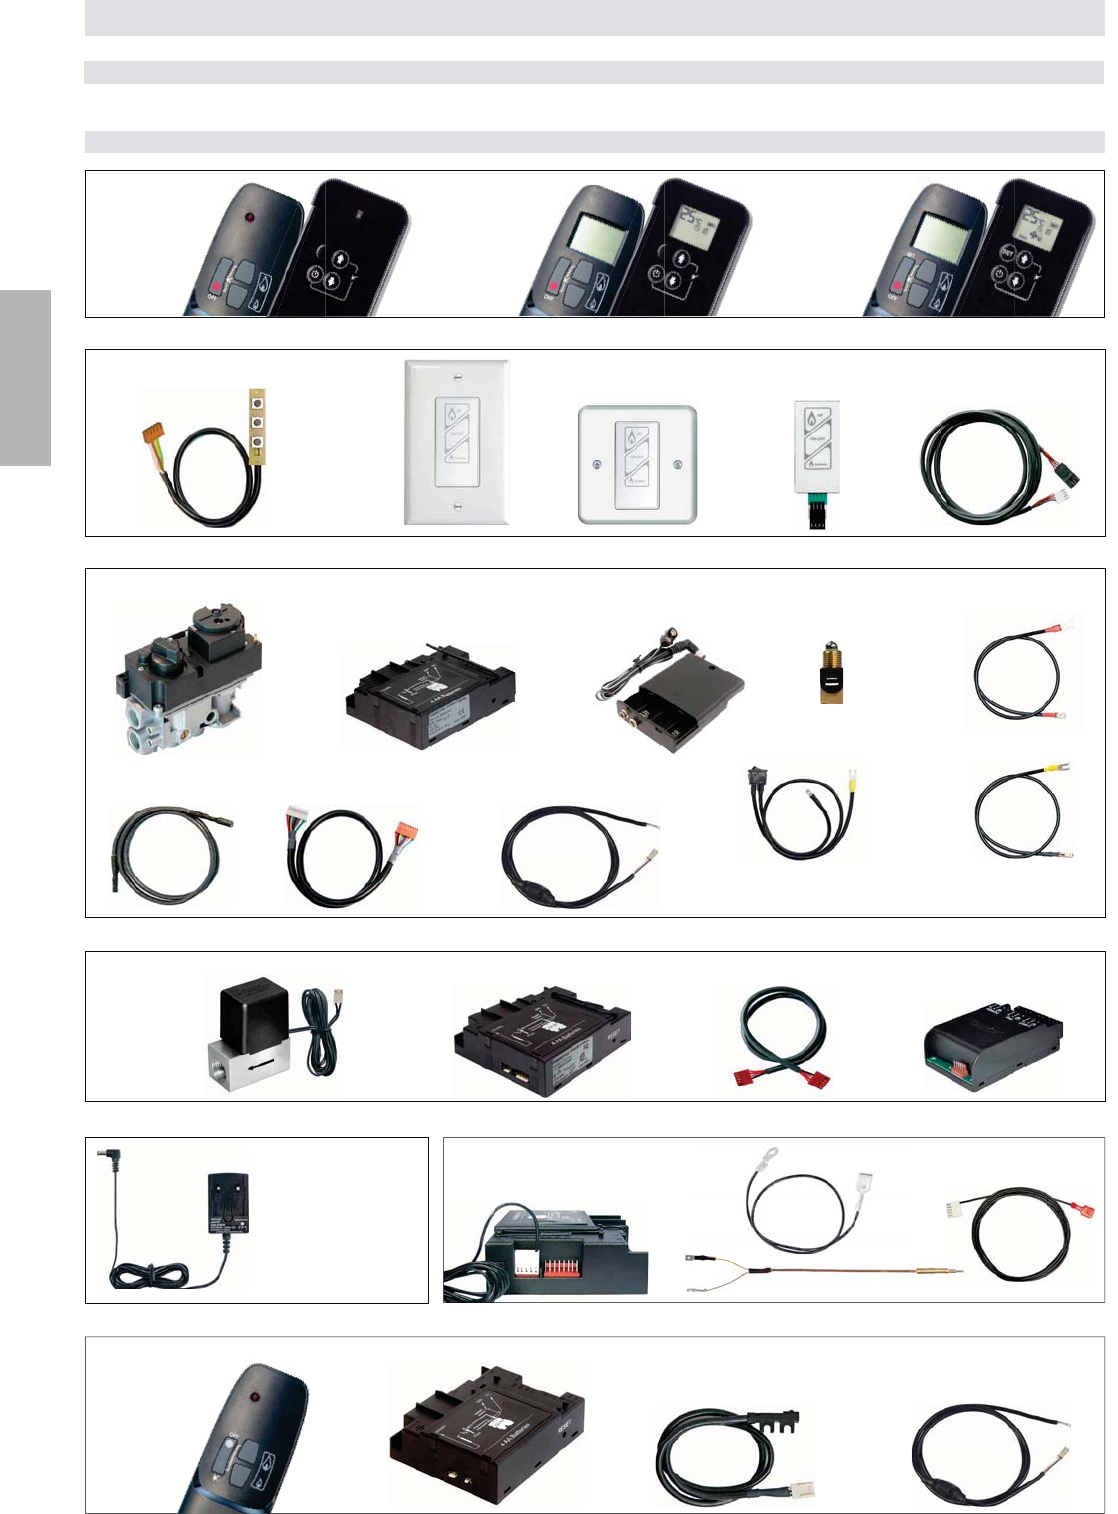 mertik maxitrol g30 remote control instructions